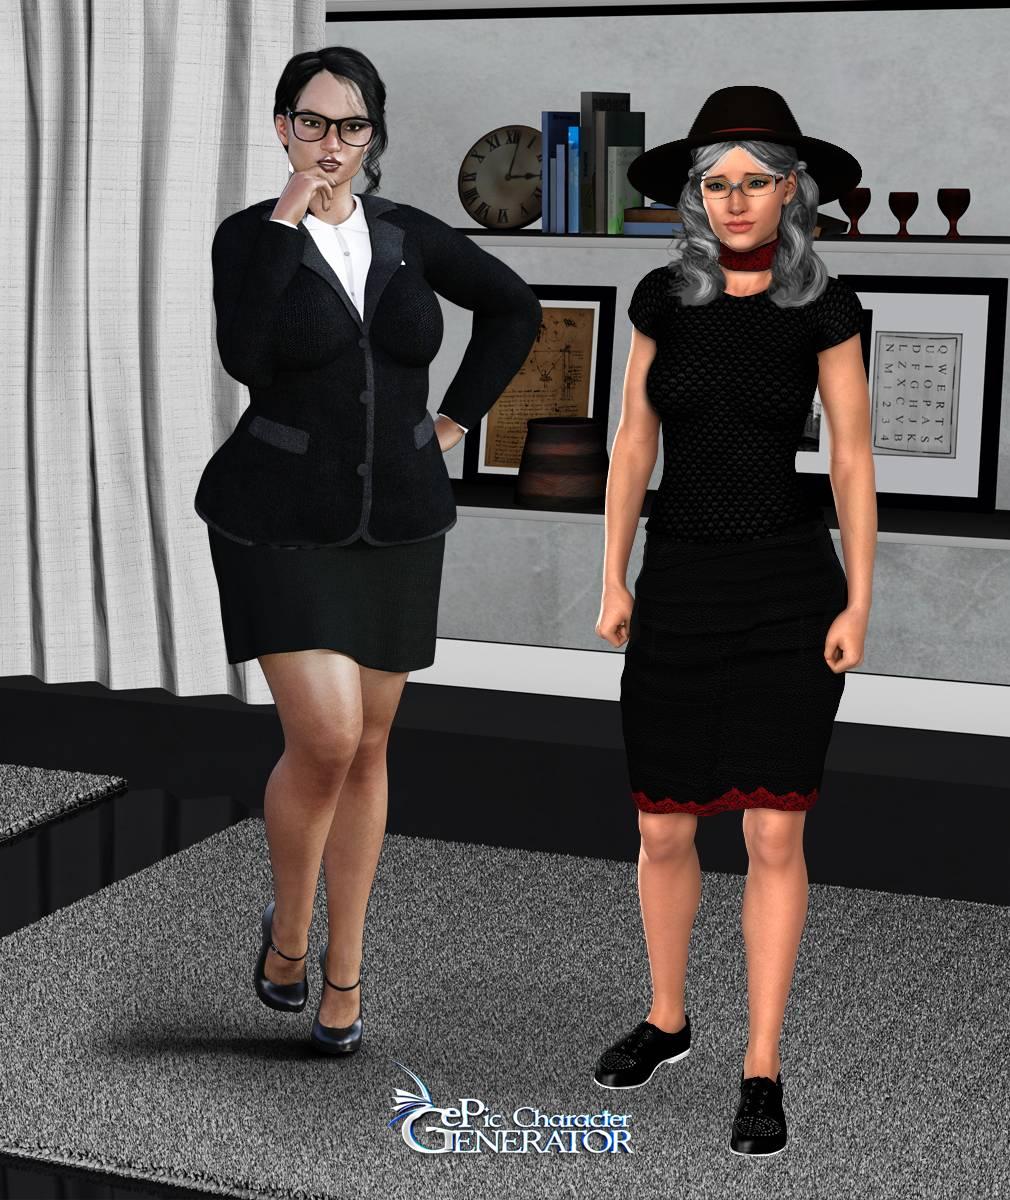 ePic Character Generator Season 2 Female Modern 2 Screenshot 04